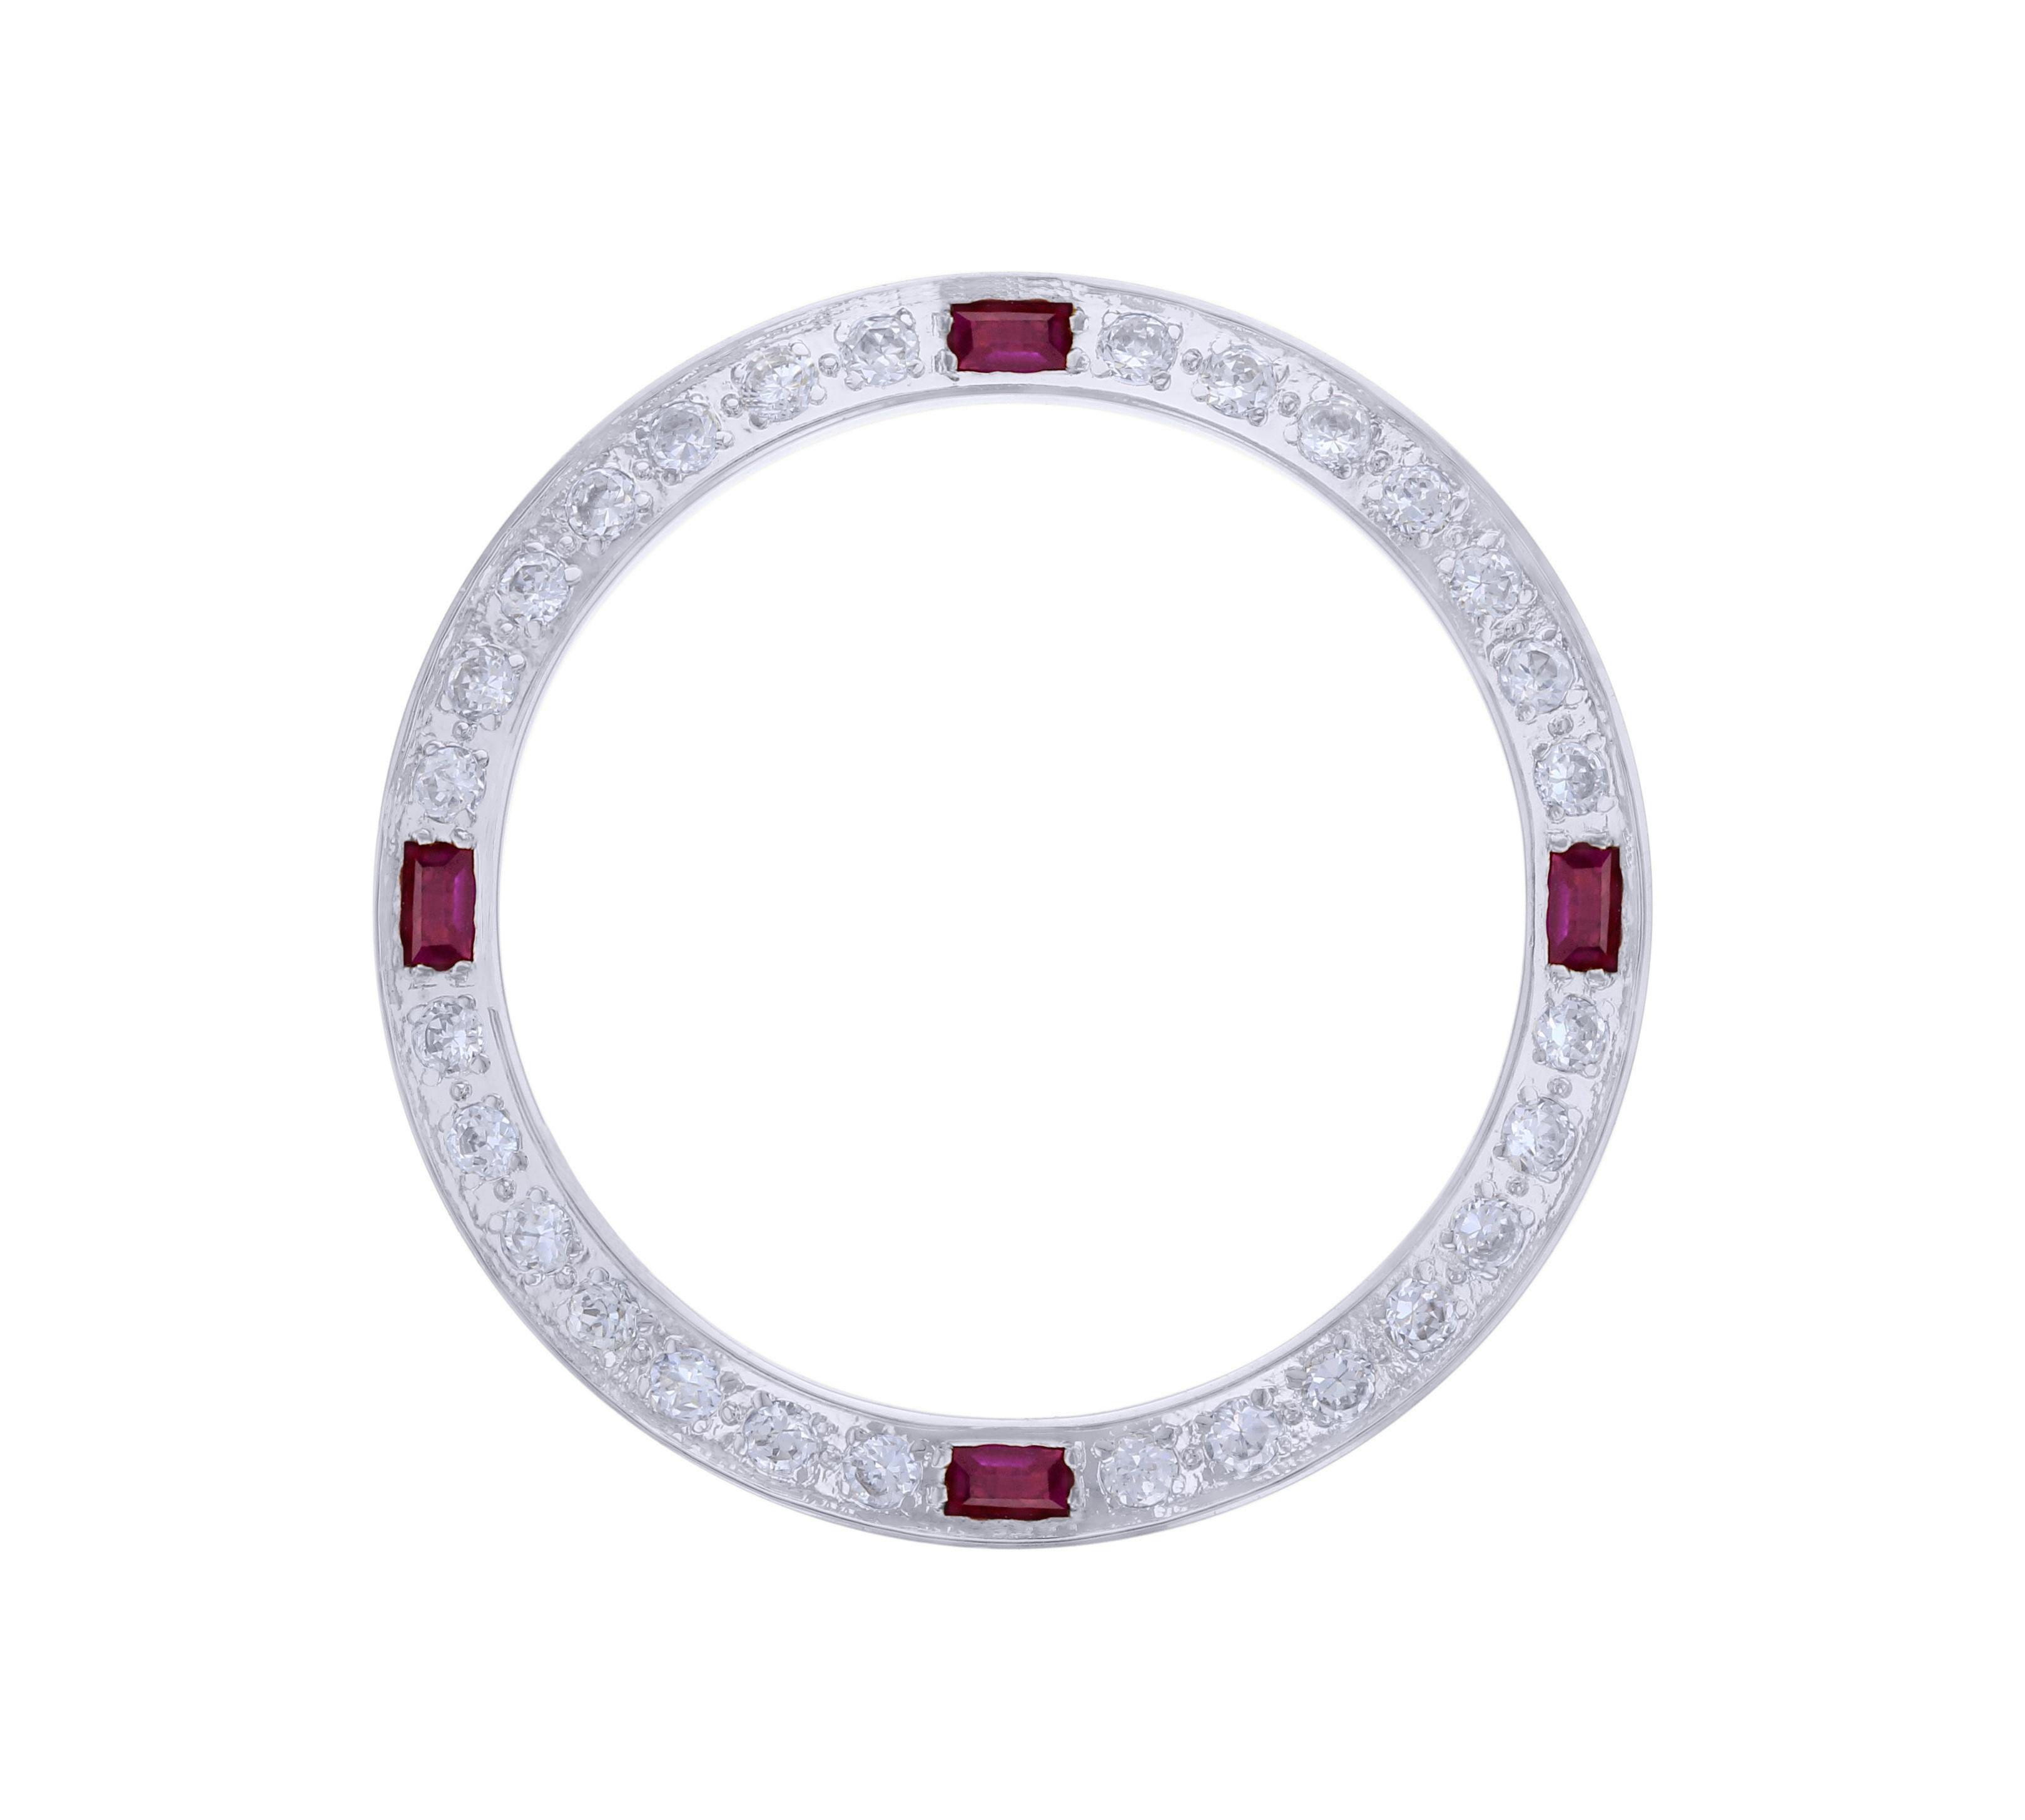 CREATED DIAMOND RUBY BEZEL FOR 26MM ROLEX TUDOR DATE DATEJUST WATCH WHITE